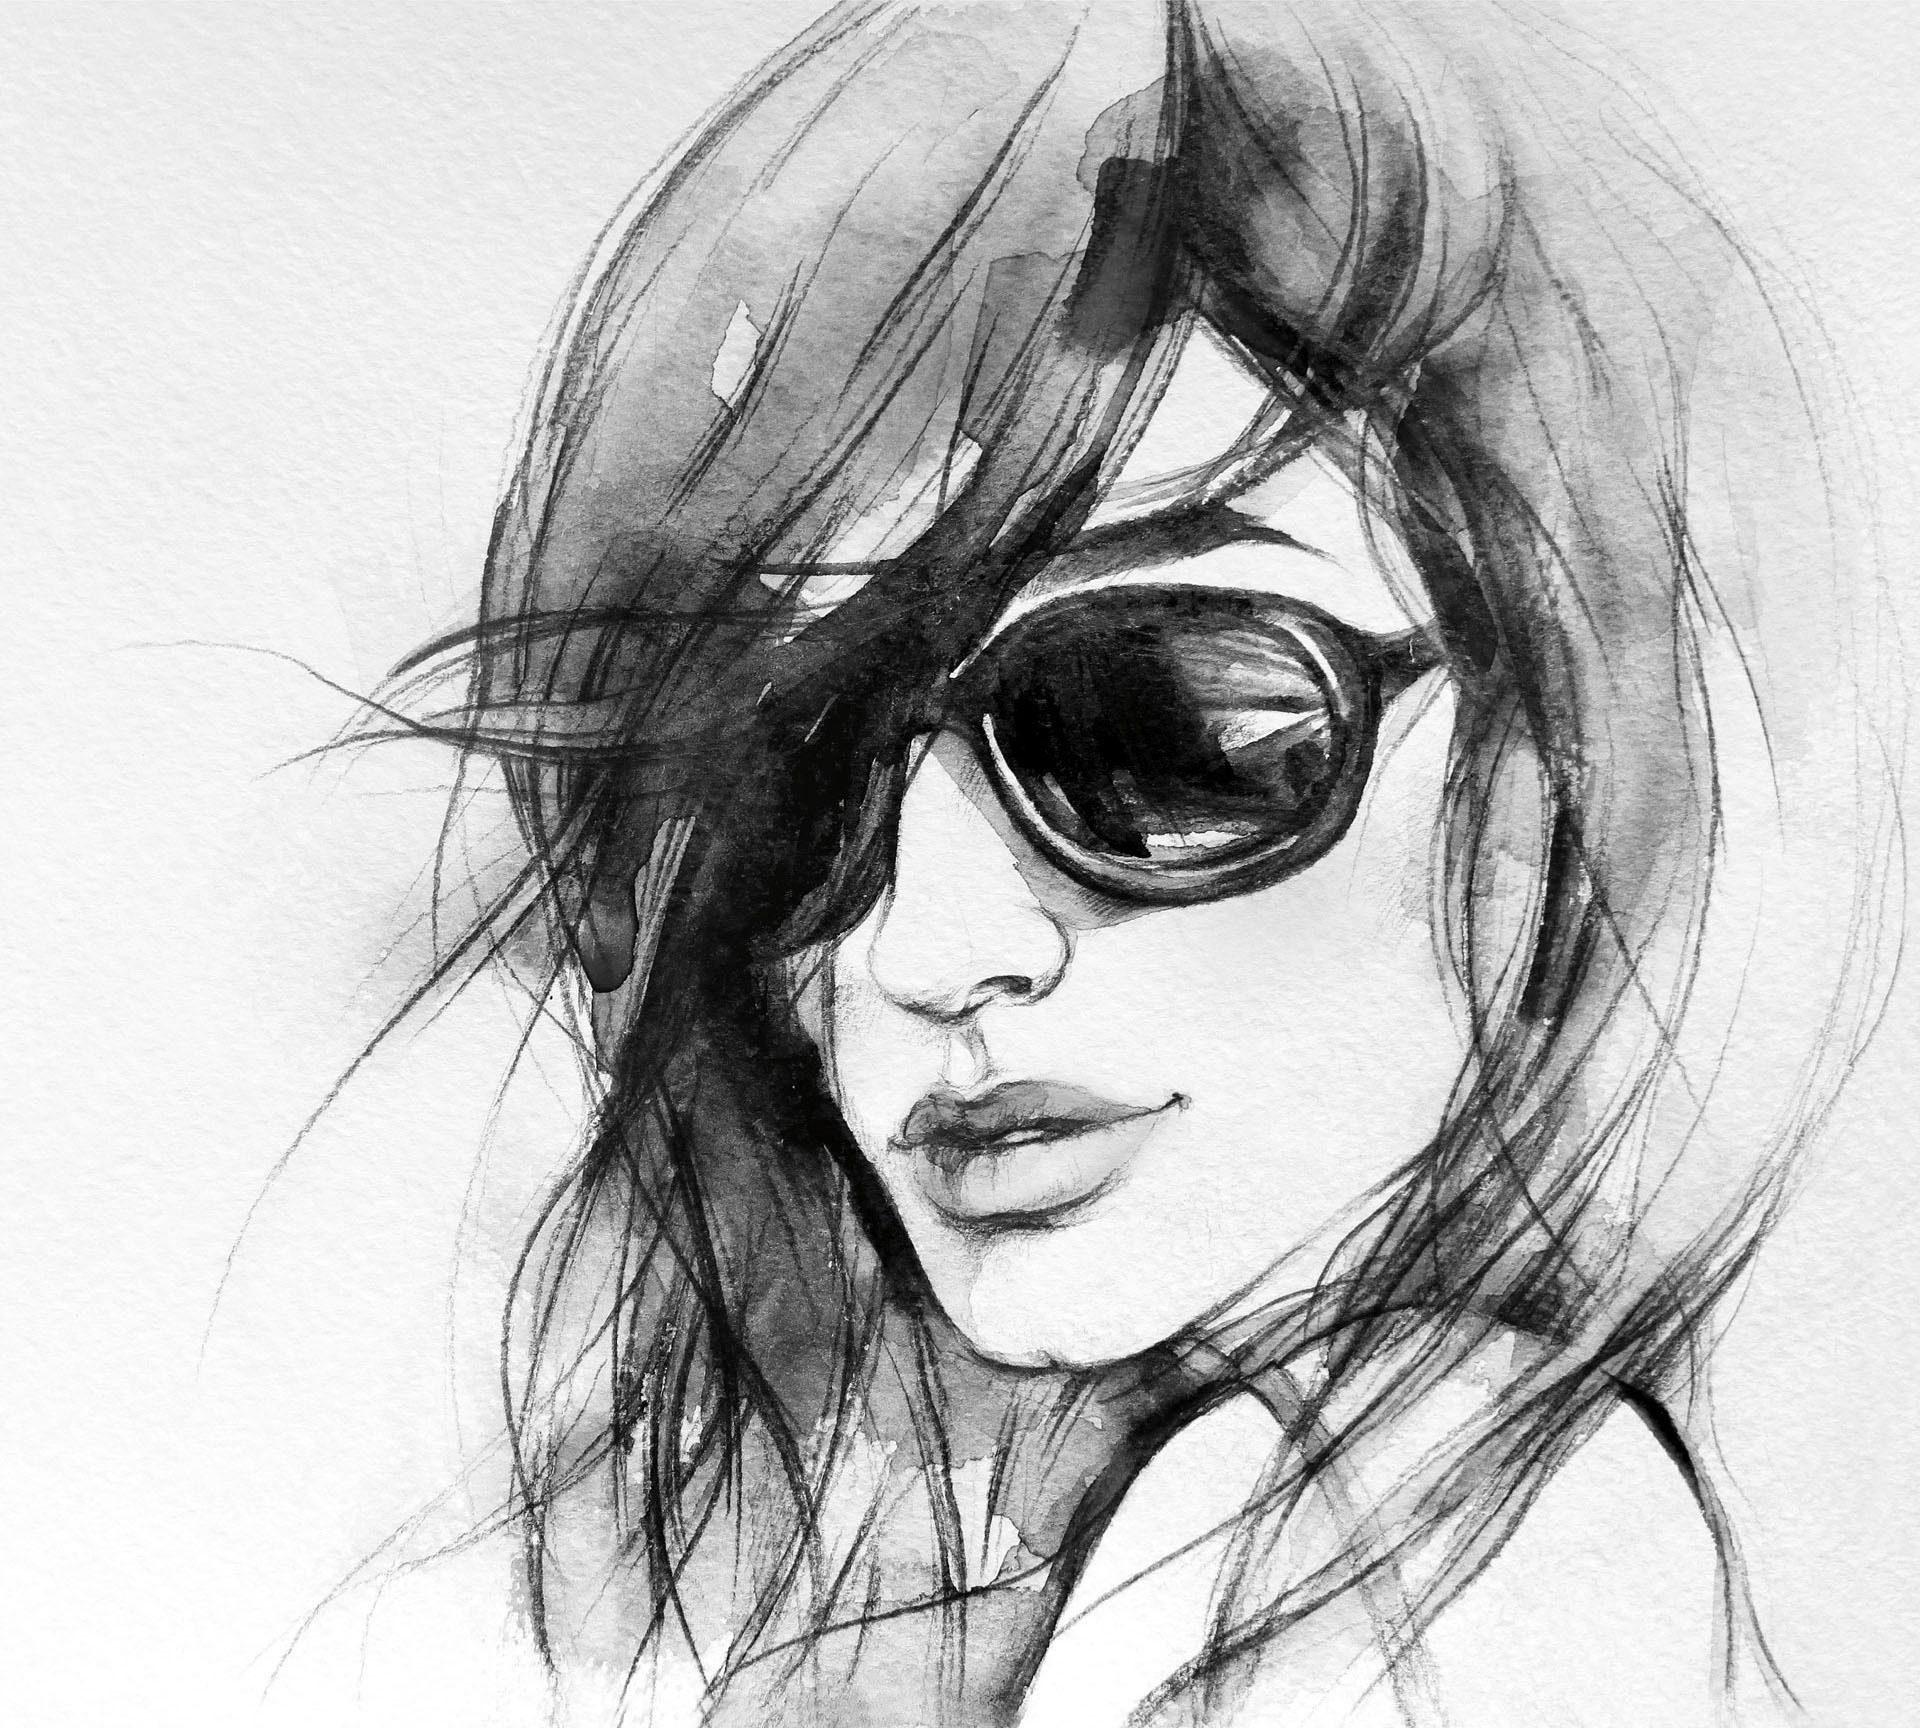 Fototapete »I wear my sunglasses« 288/260 cm